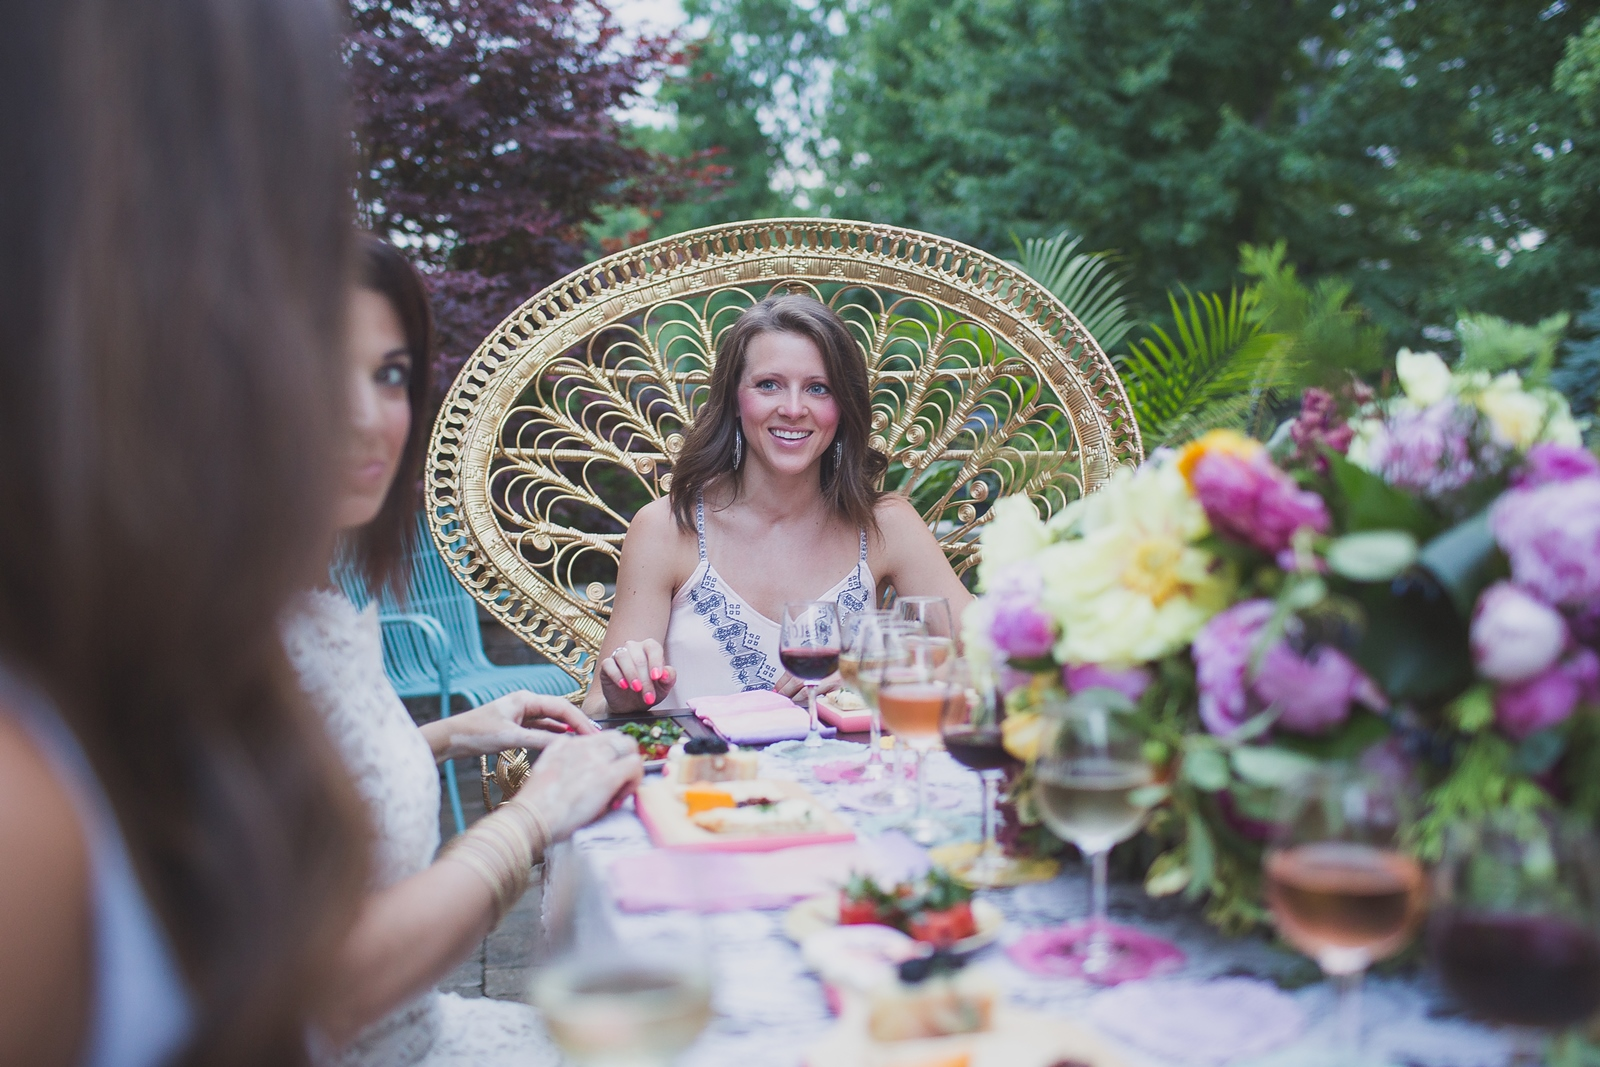 wine-tasting-one-stylish-party-86